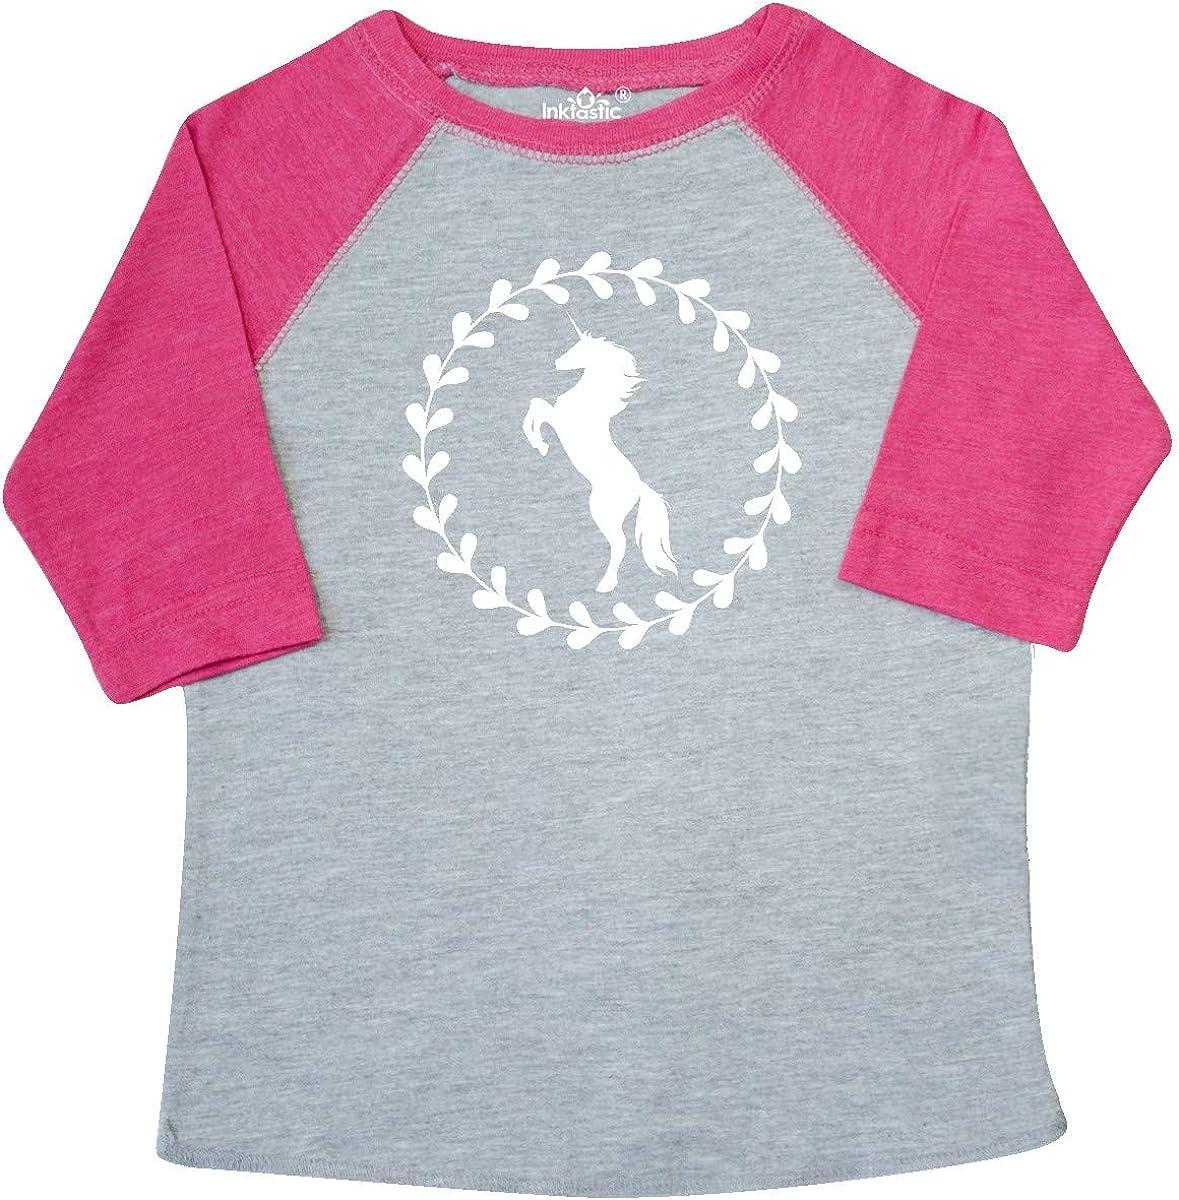 inktastic Unicorn Gift Idea Toddler T-Shirt